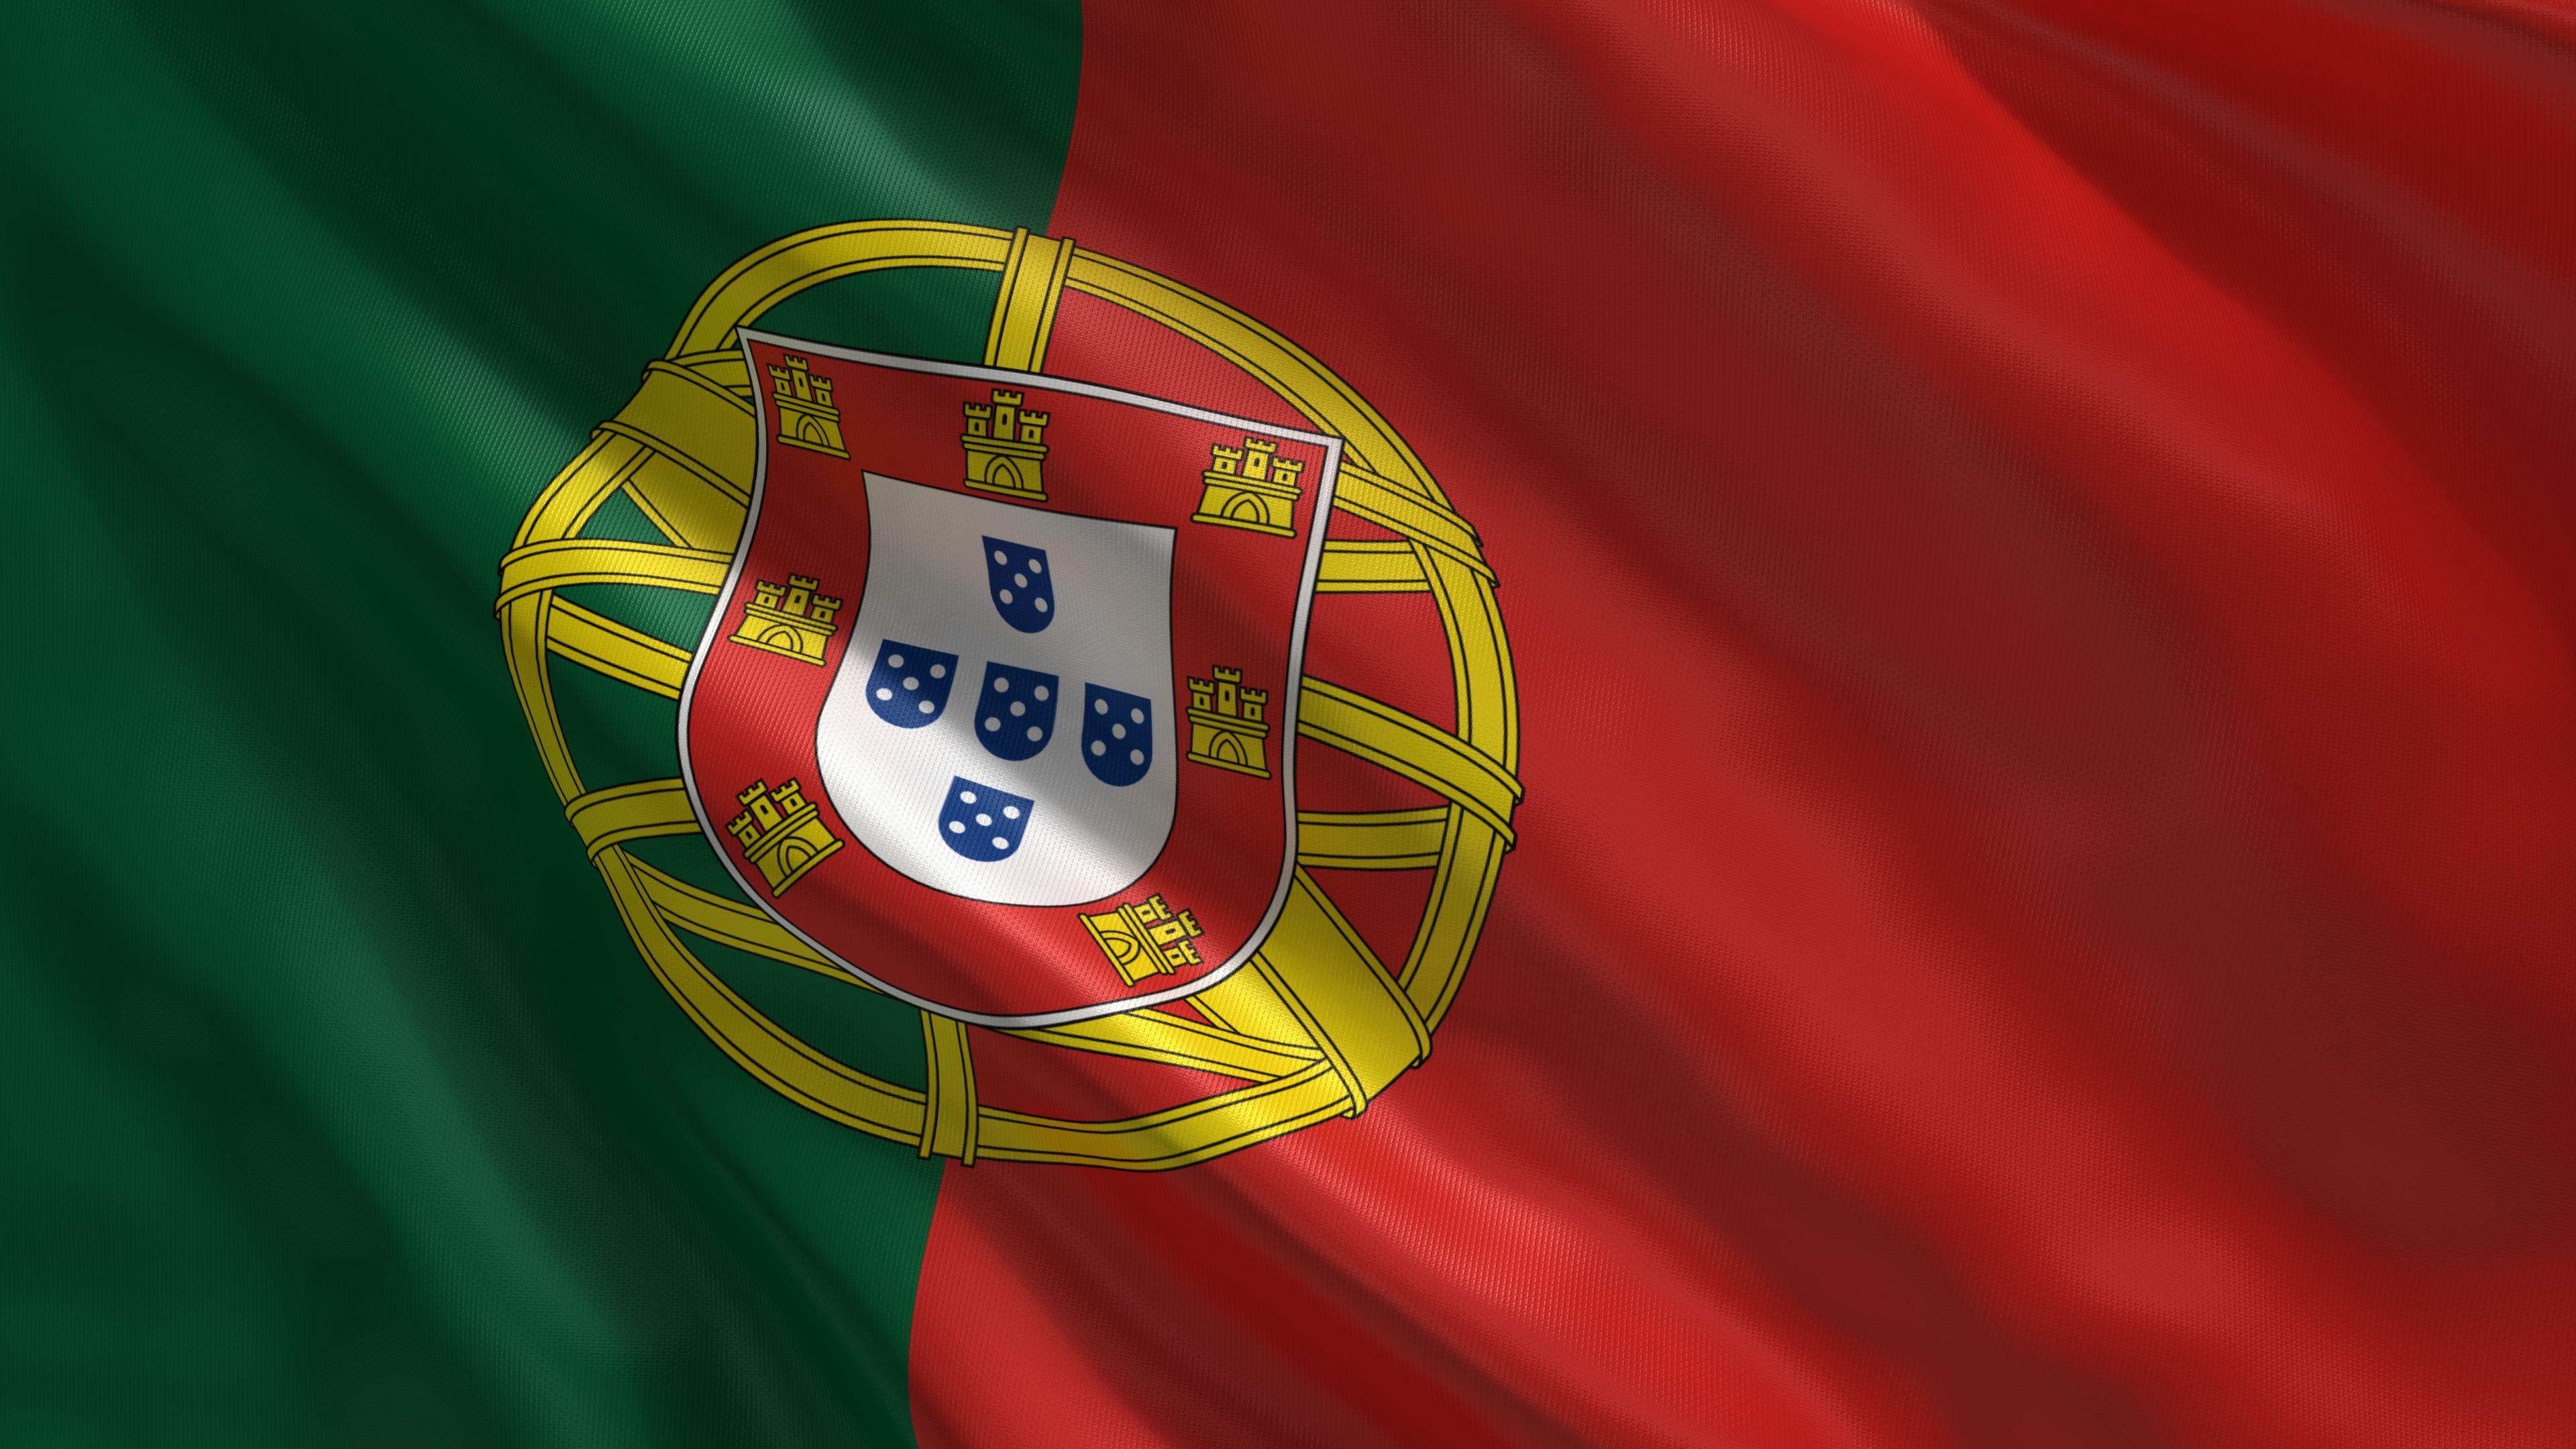 Картинка флага португалия